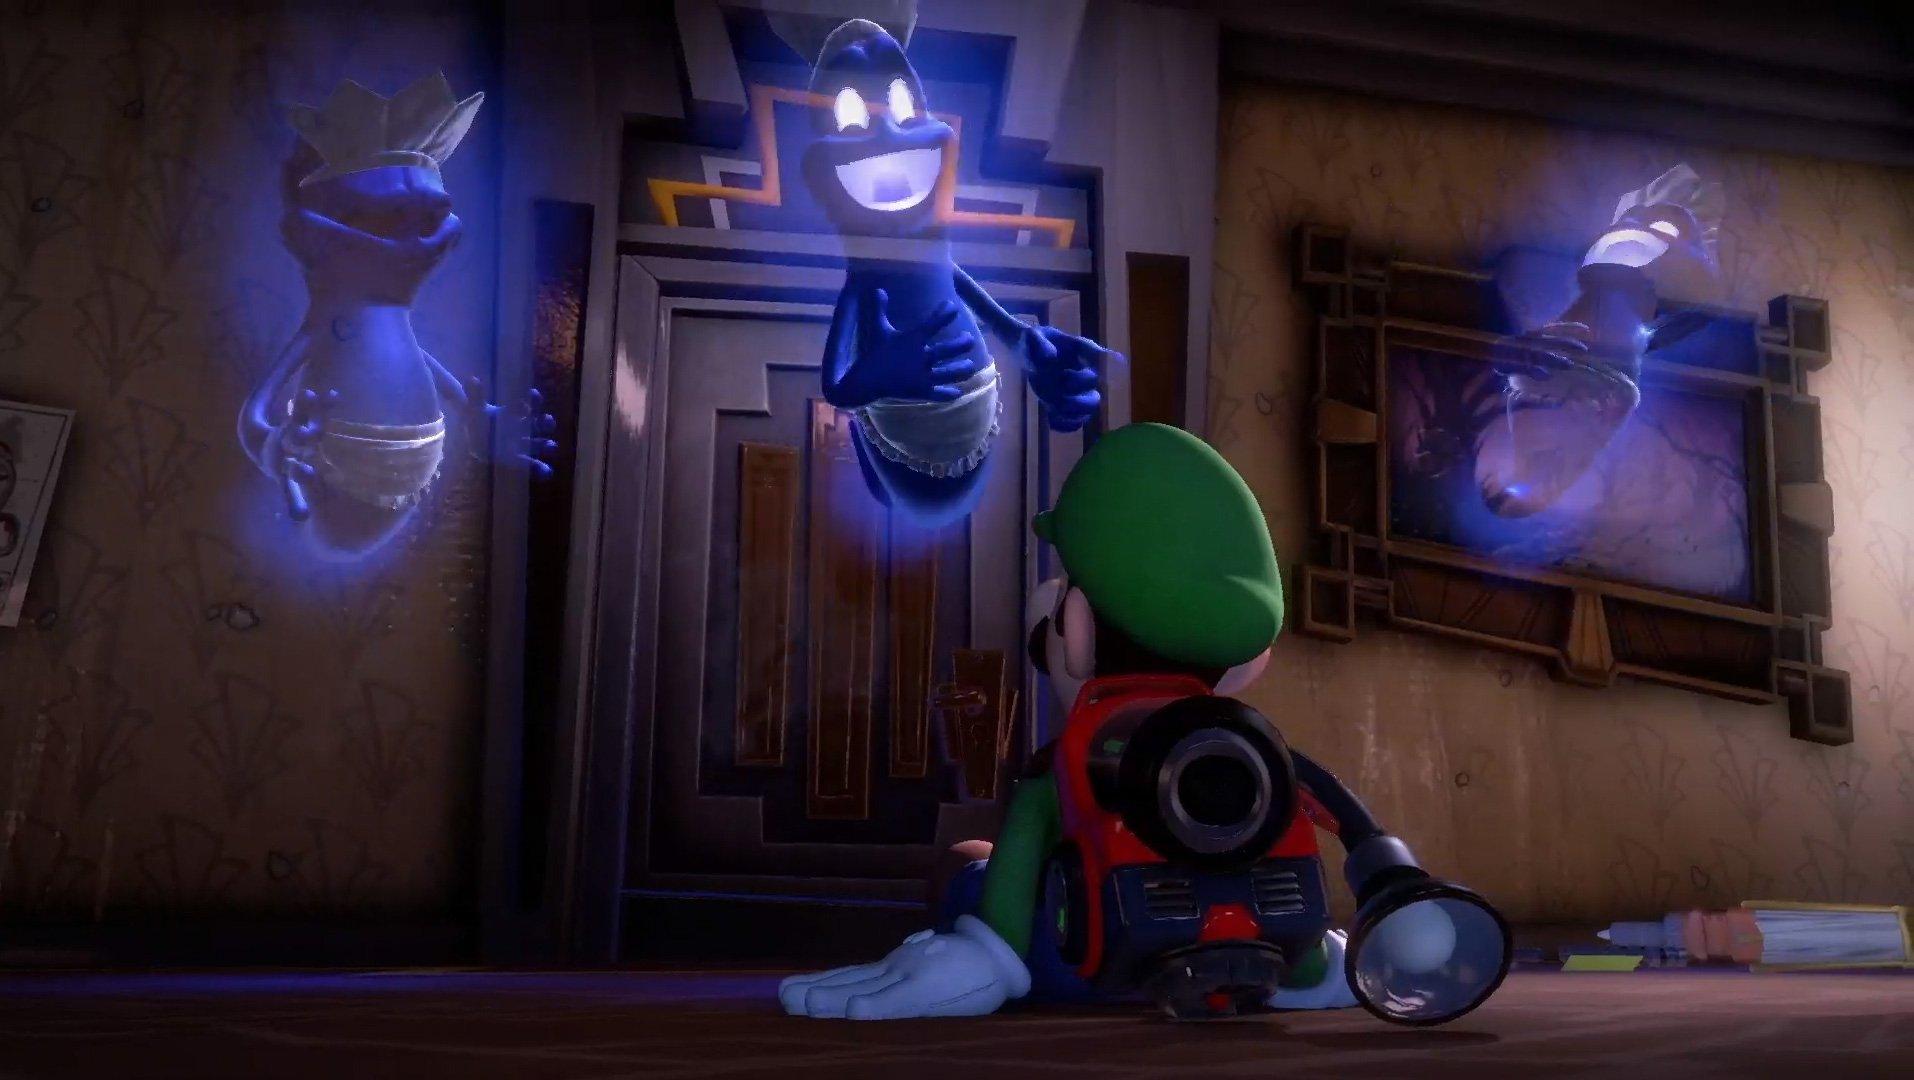 Nintendo Direct broadcast scheduled for Wednesday, September